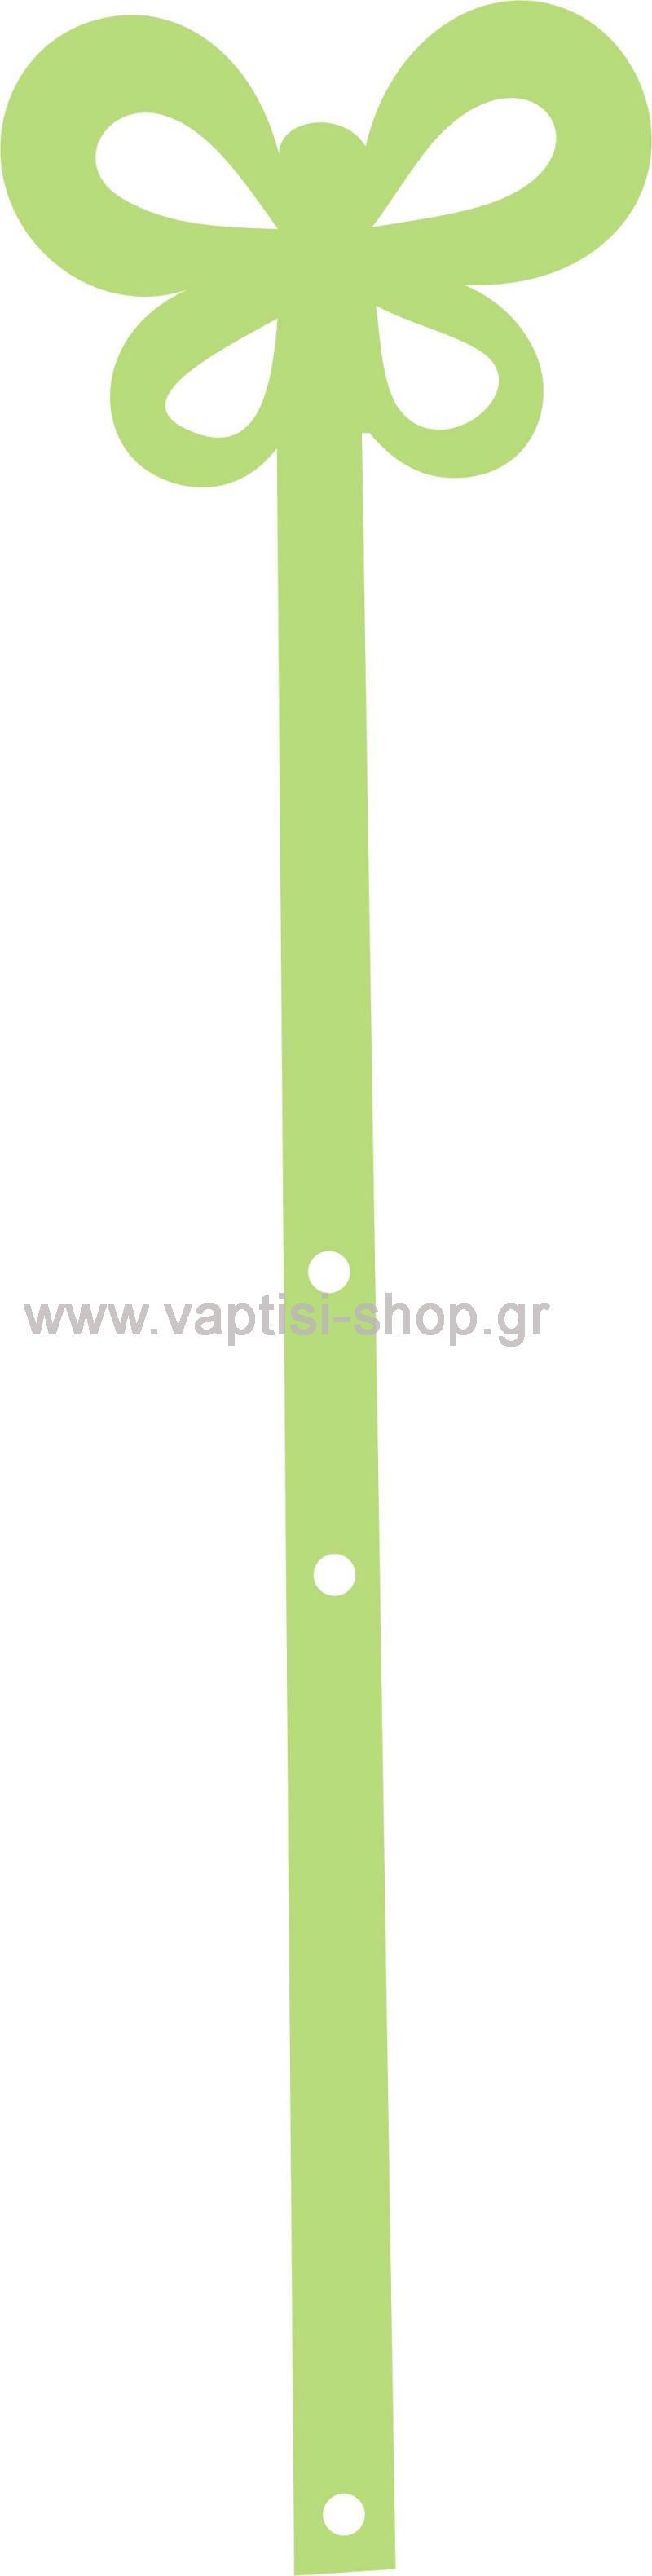 Plexiglass (Stick)